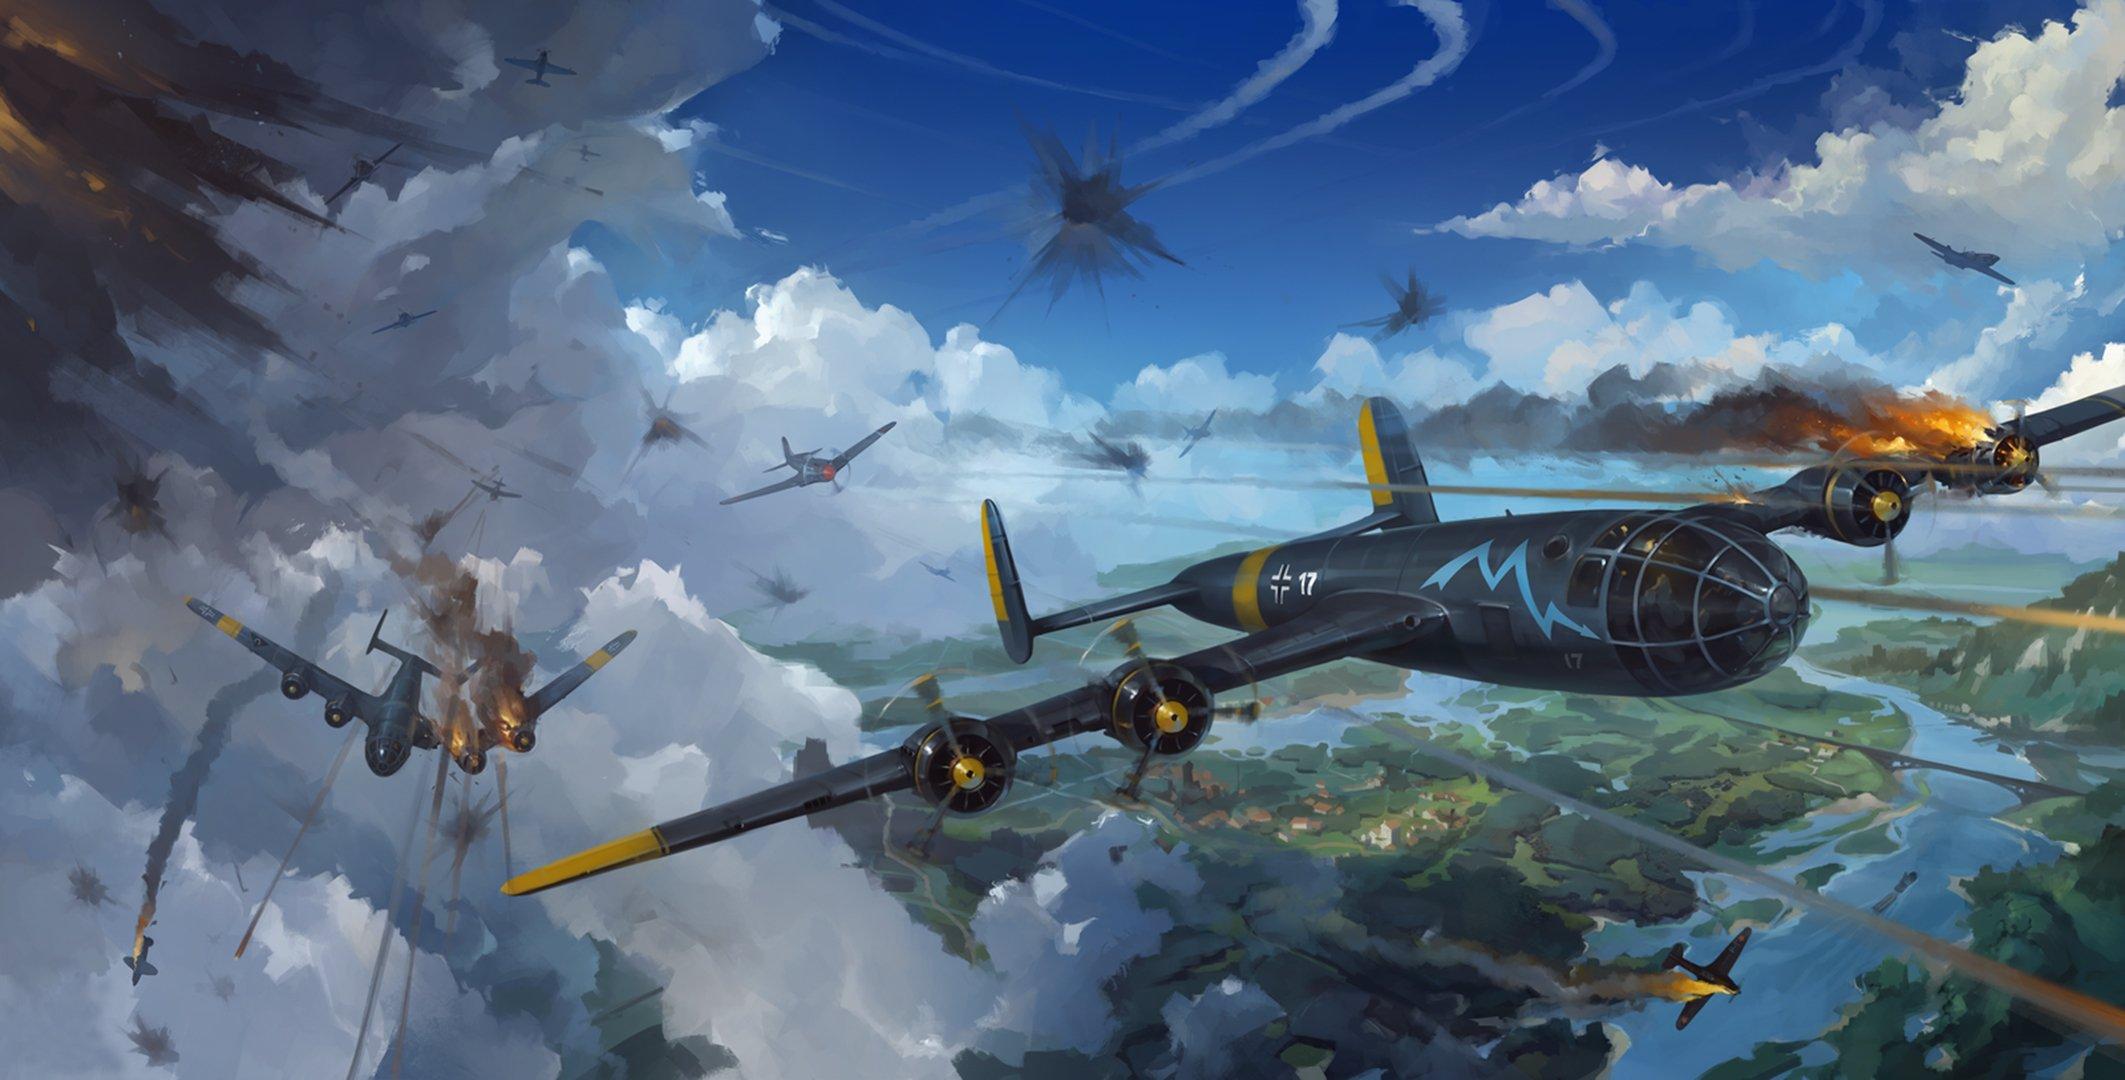 Обои земля, Облака, битва, самолеты, война. Авиация foto 6